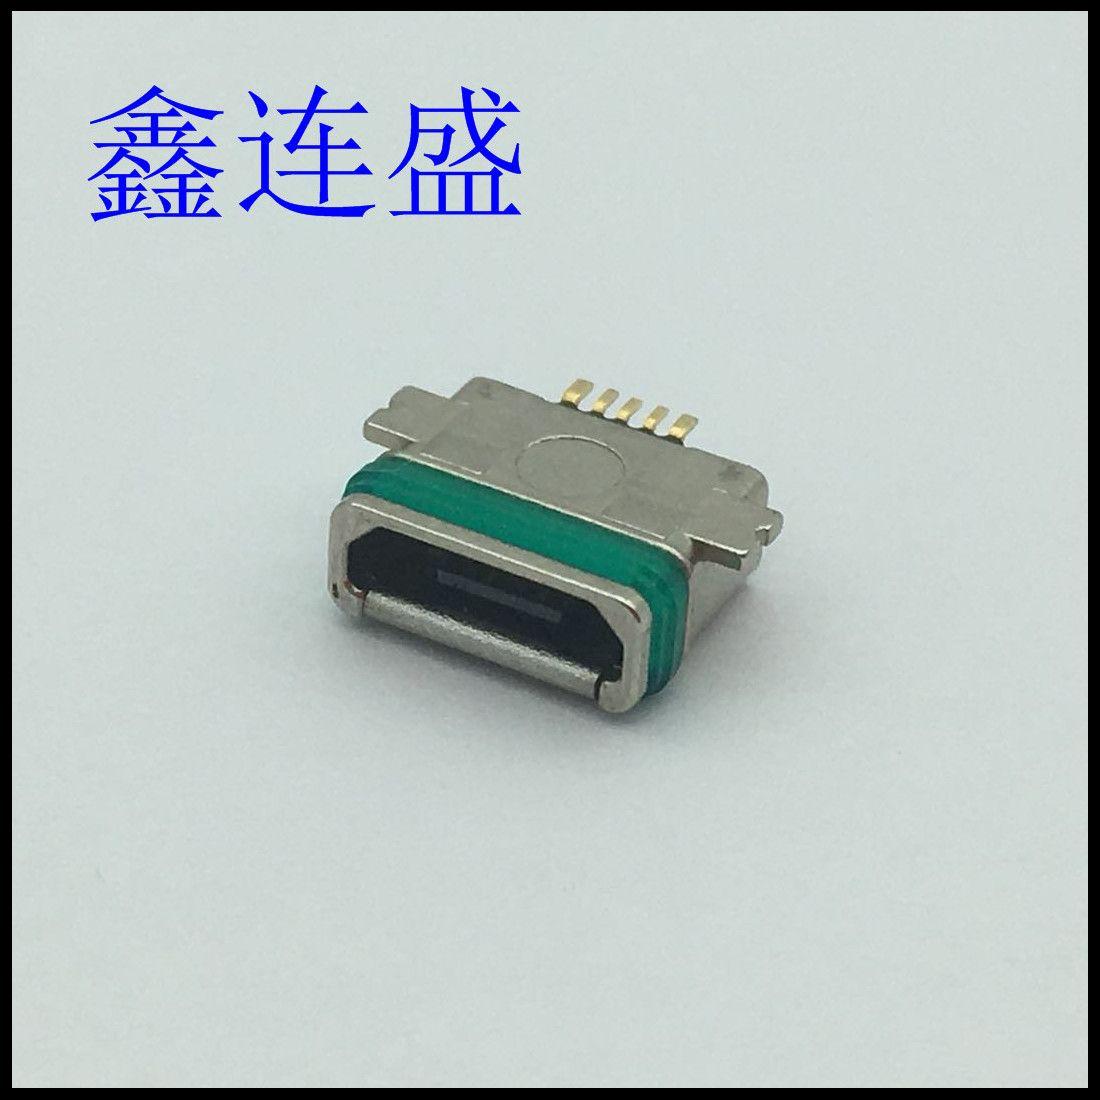 MICOR USB 5P 母座防水全贴 贴板